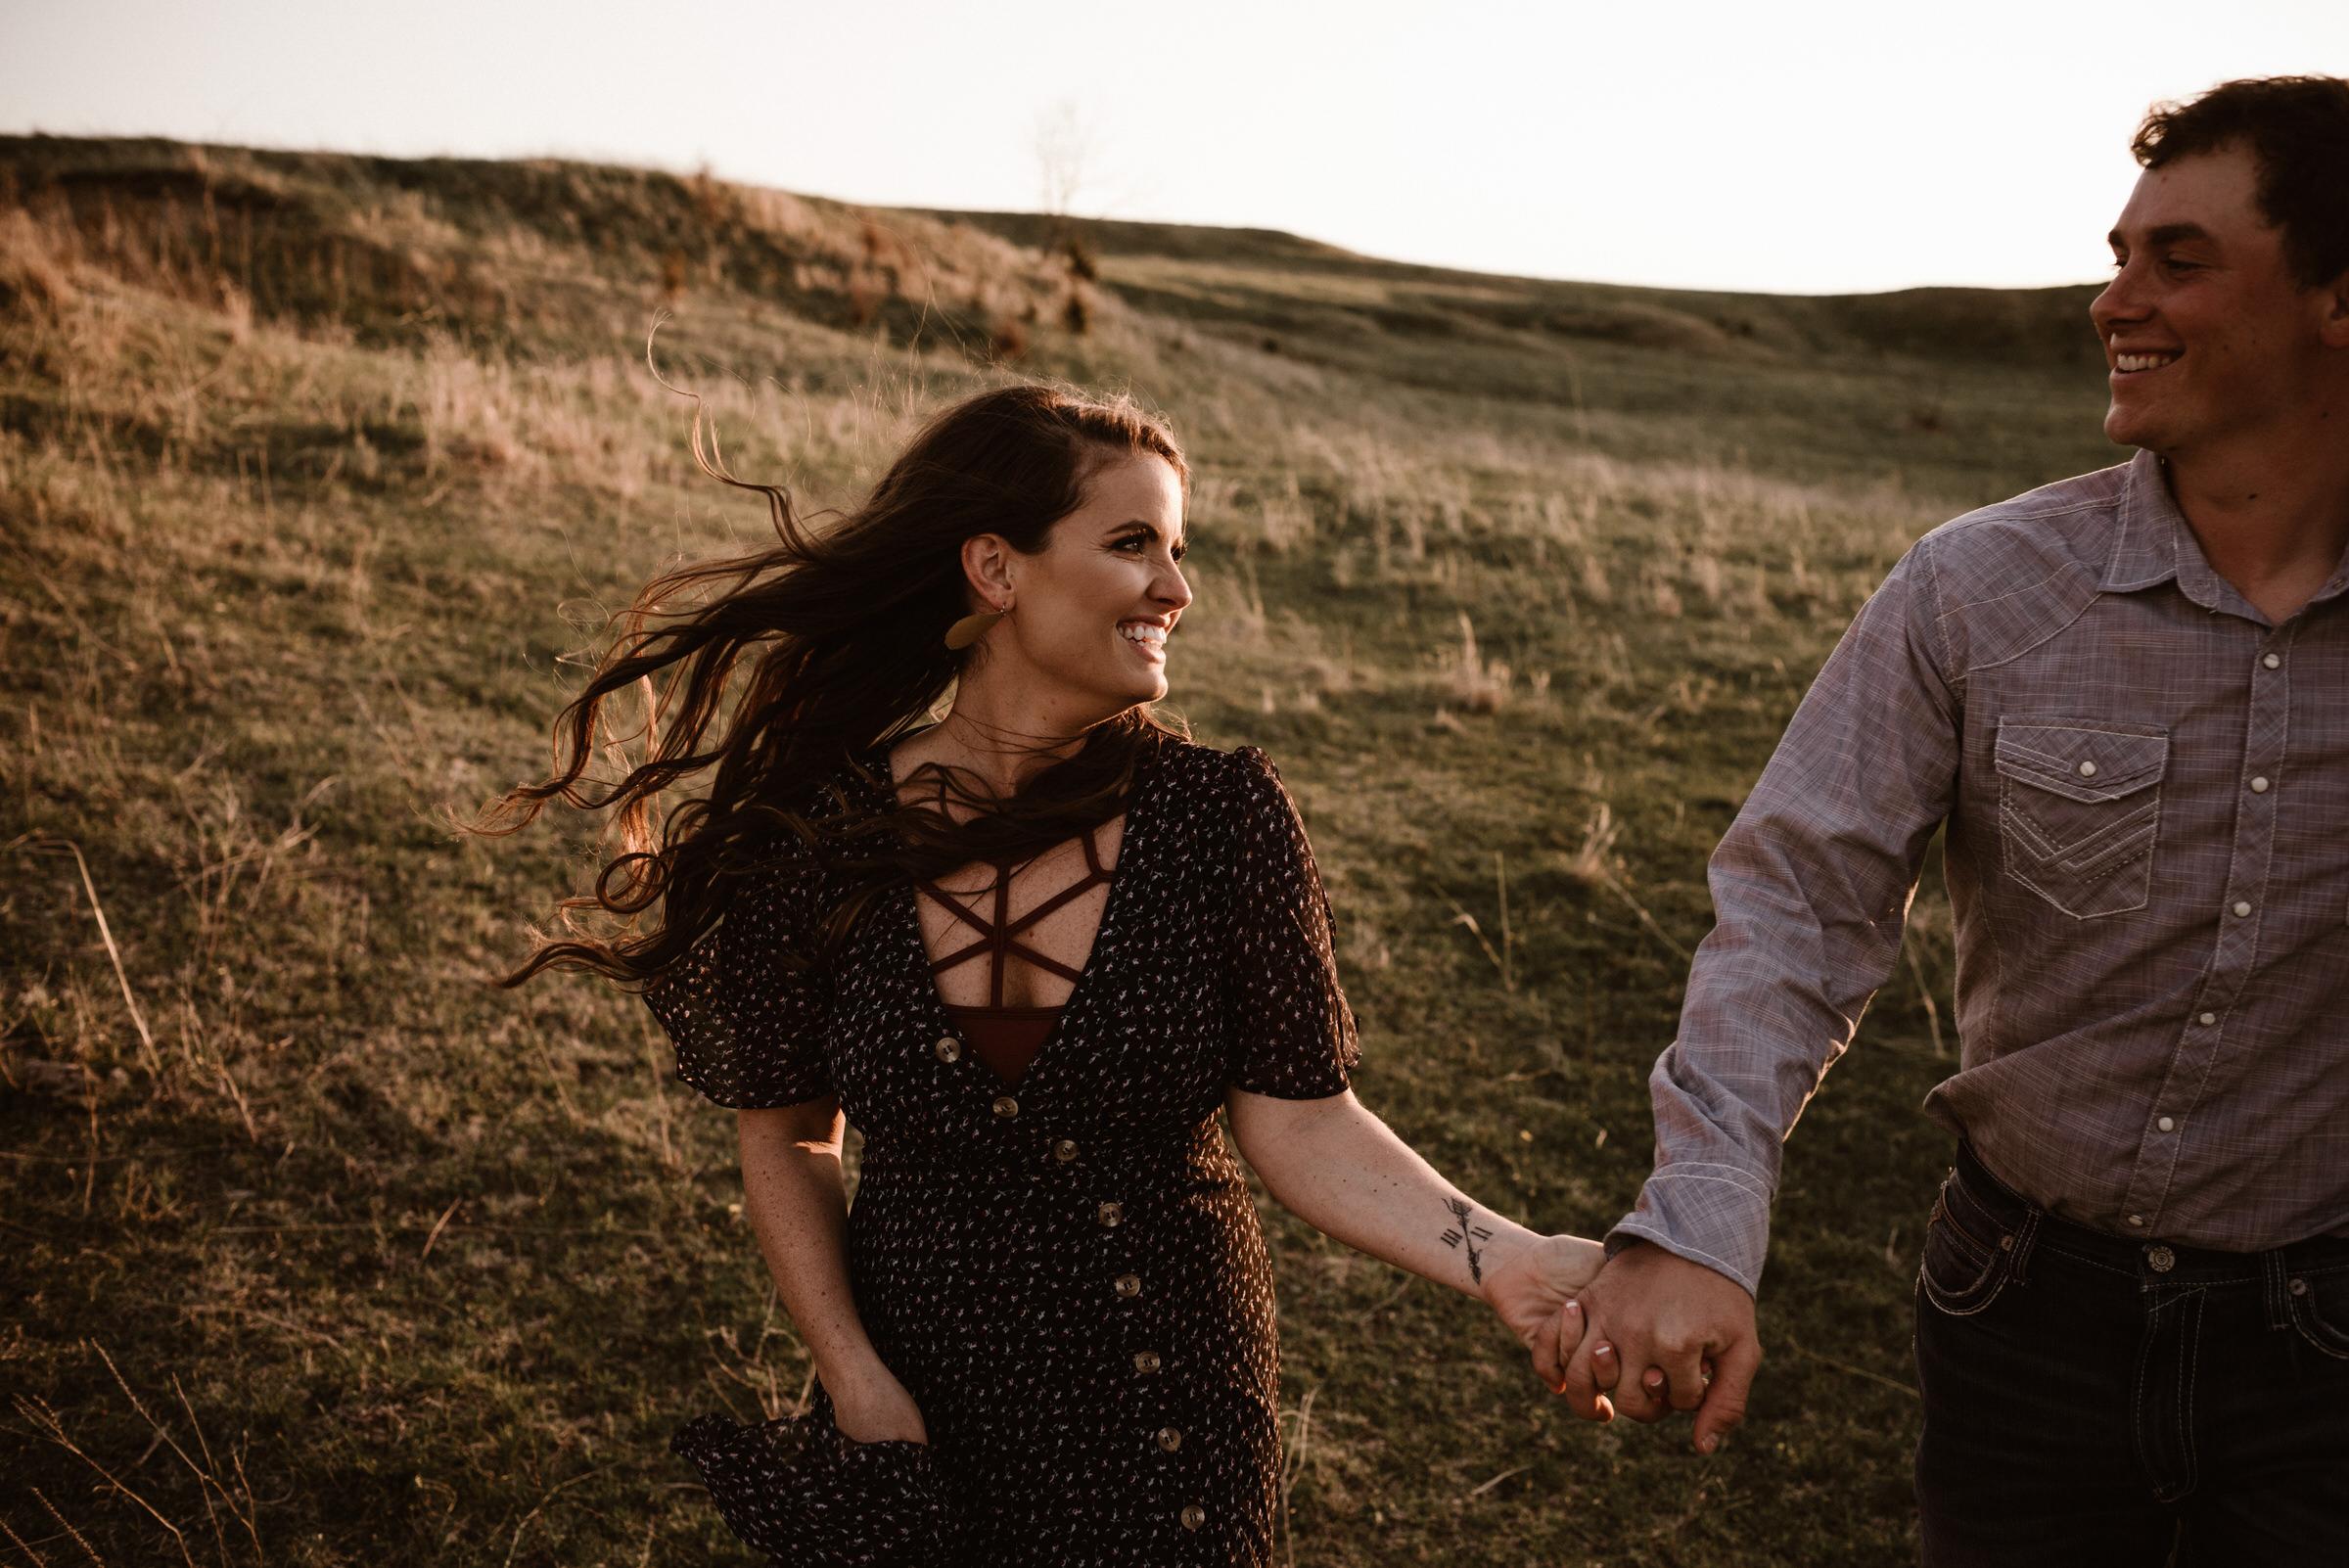 Sandhills-Nebraska-Engagement-Wedding-Photographer-Kaylie-Sirek-Photography-028.jpg